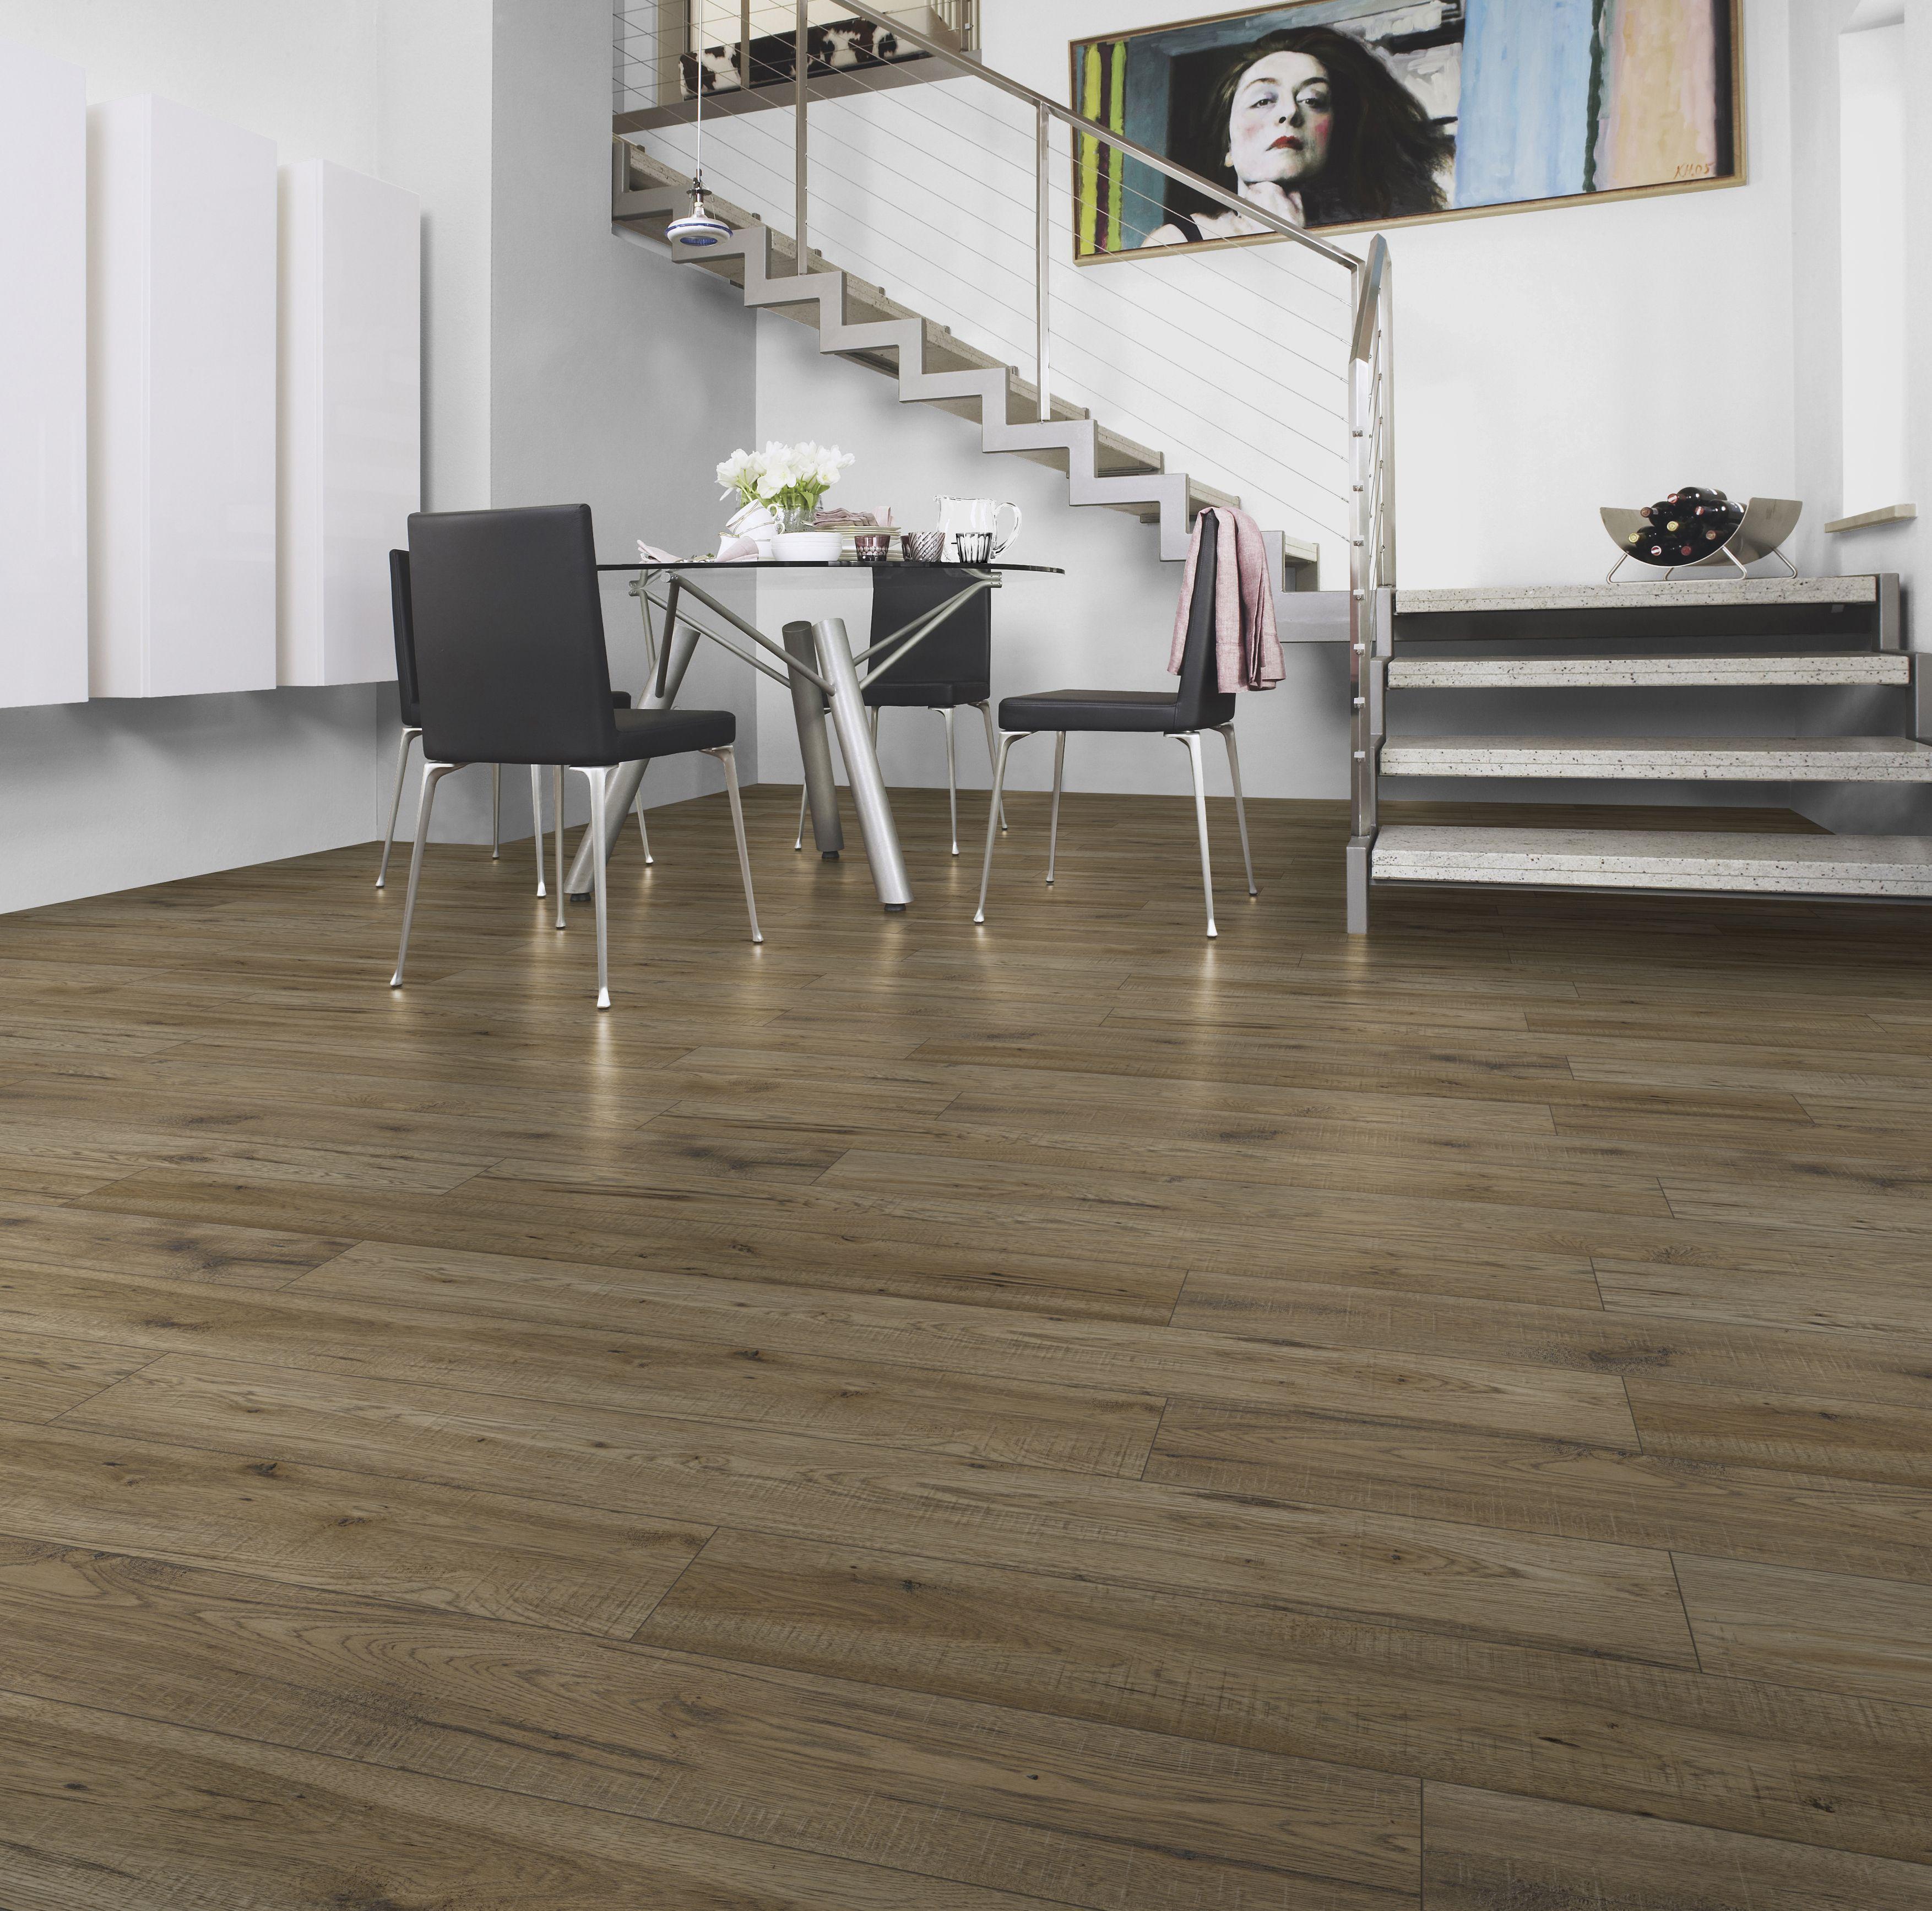 Ostend Kansas Effect Antique Finish Laminate Flooring 1 76